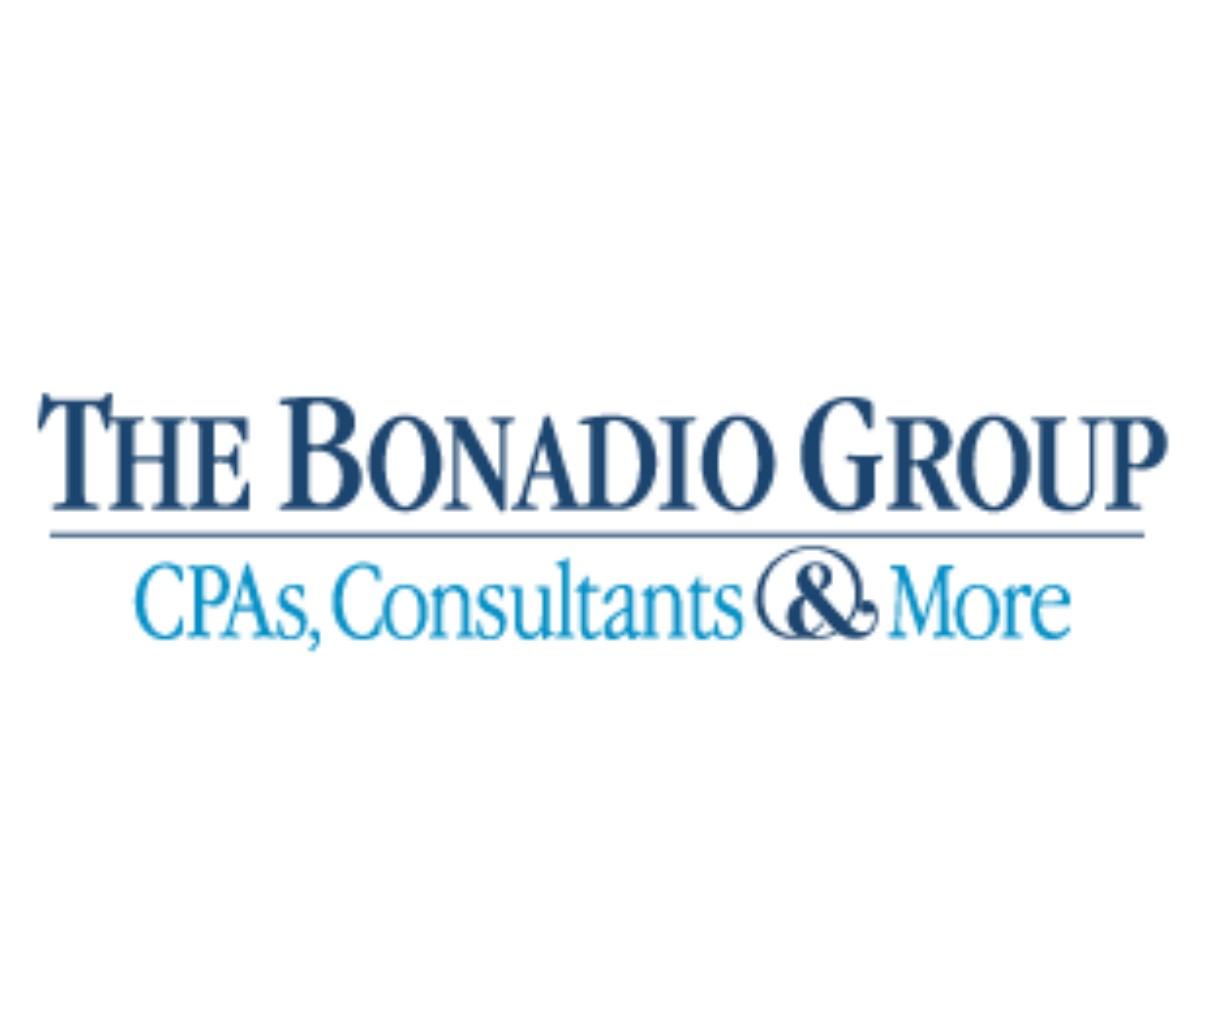 BonadioGroup-Logo-ConventionSponsor-Reel